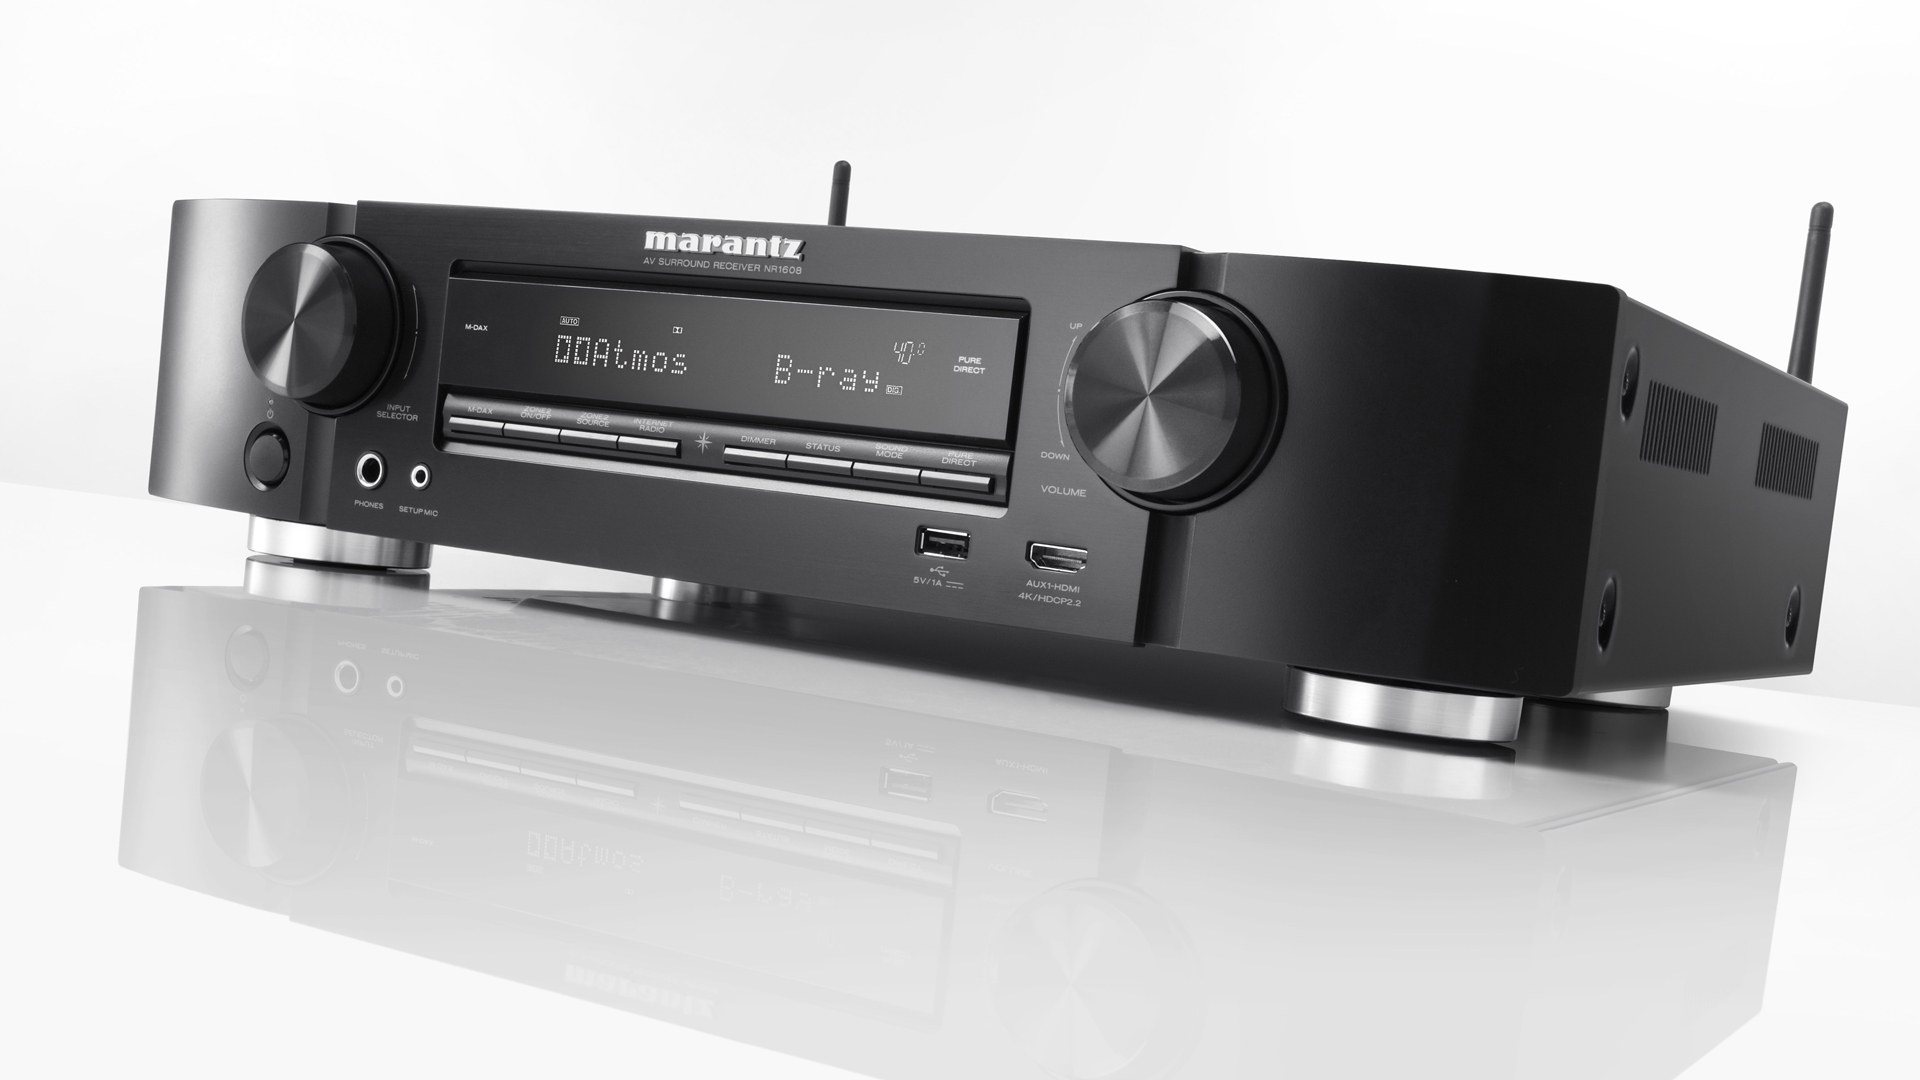 Marantz Nr1608 Dolby Atmos Av Receiver Techradar Xbox 360 Automatically Resets With Hdmi Switches Page 10 Avs Forum